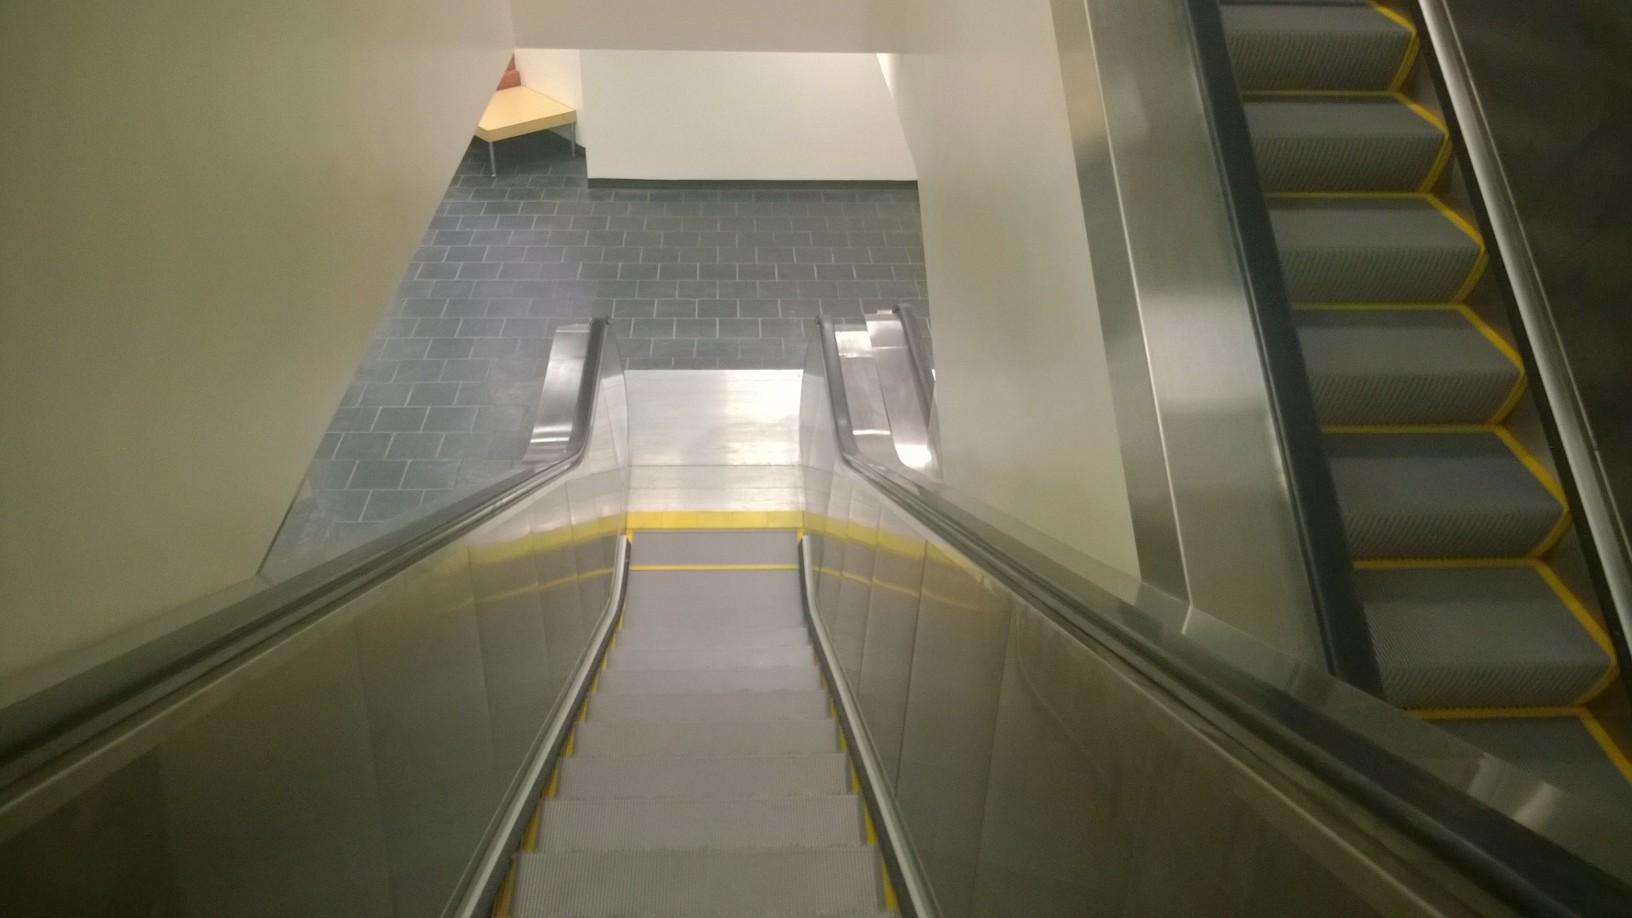 CUNY Hunter College - Escalator Upgrades